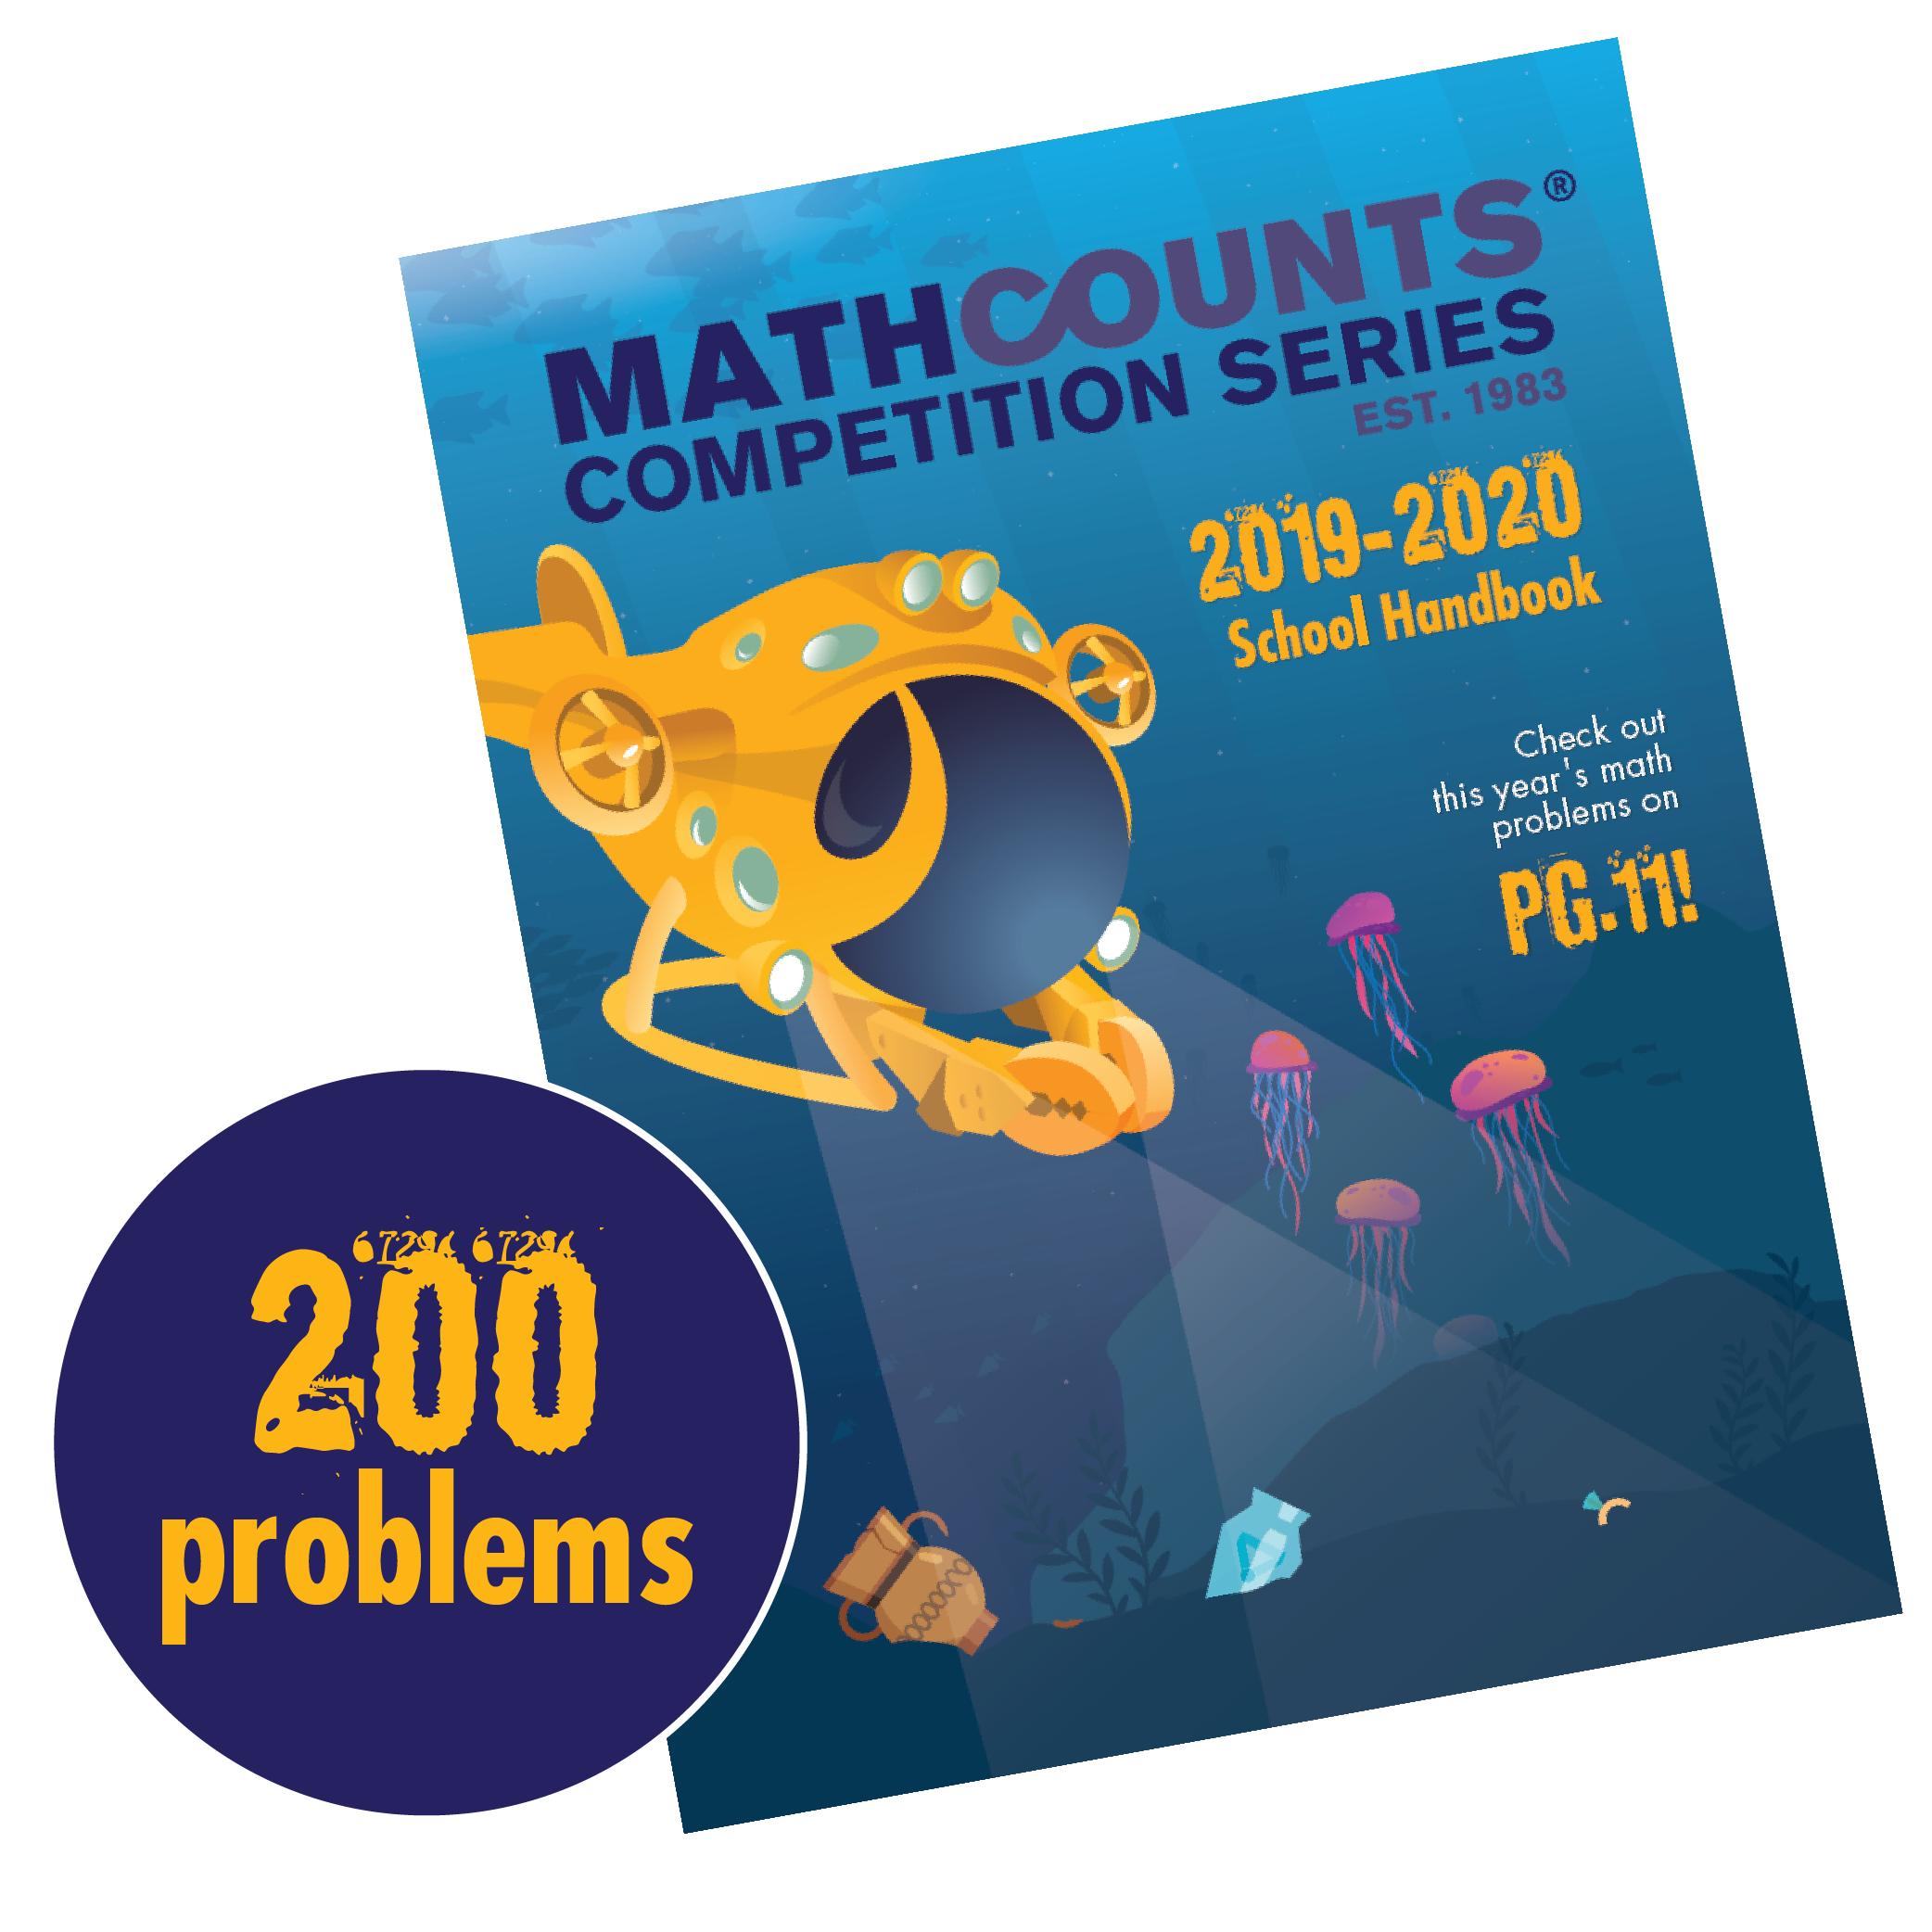 MATHCOUNTS School Handbook | MATHCOUNTS